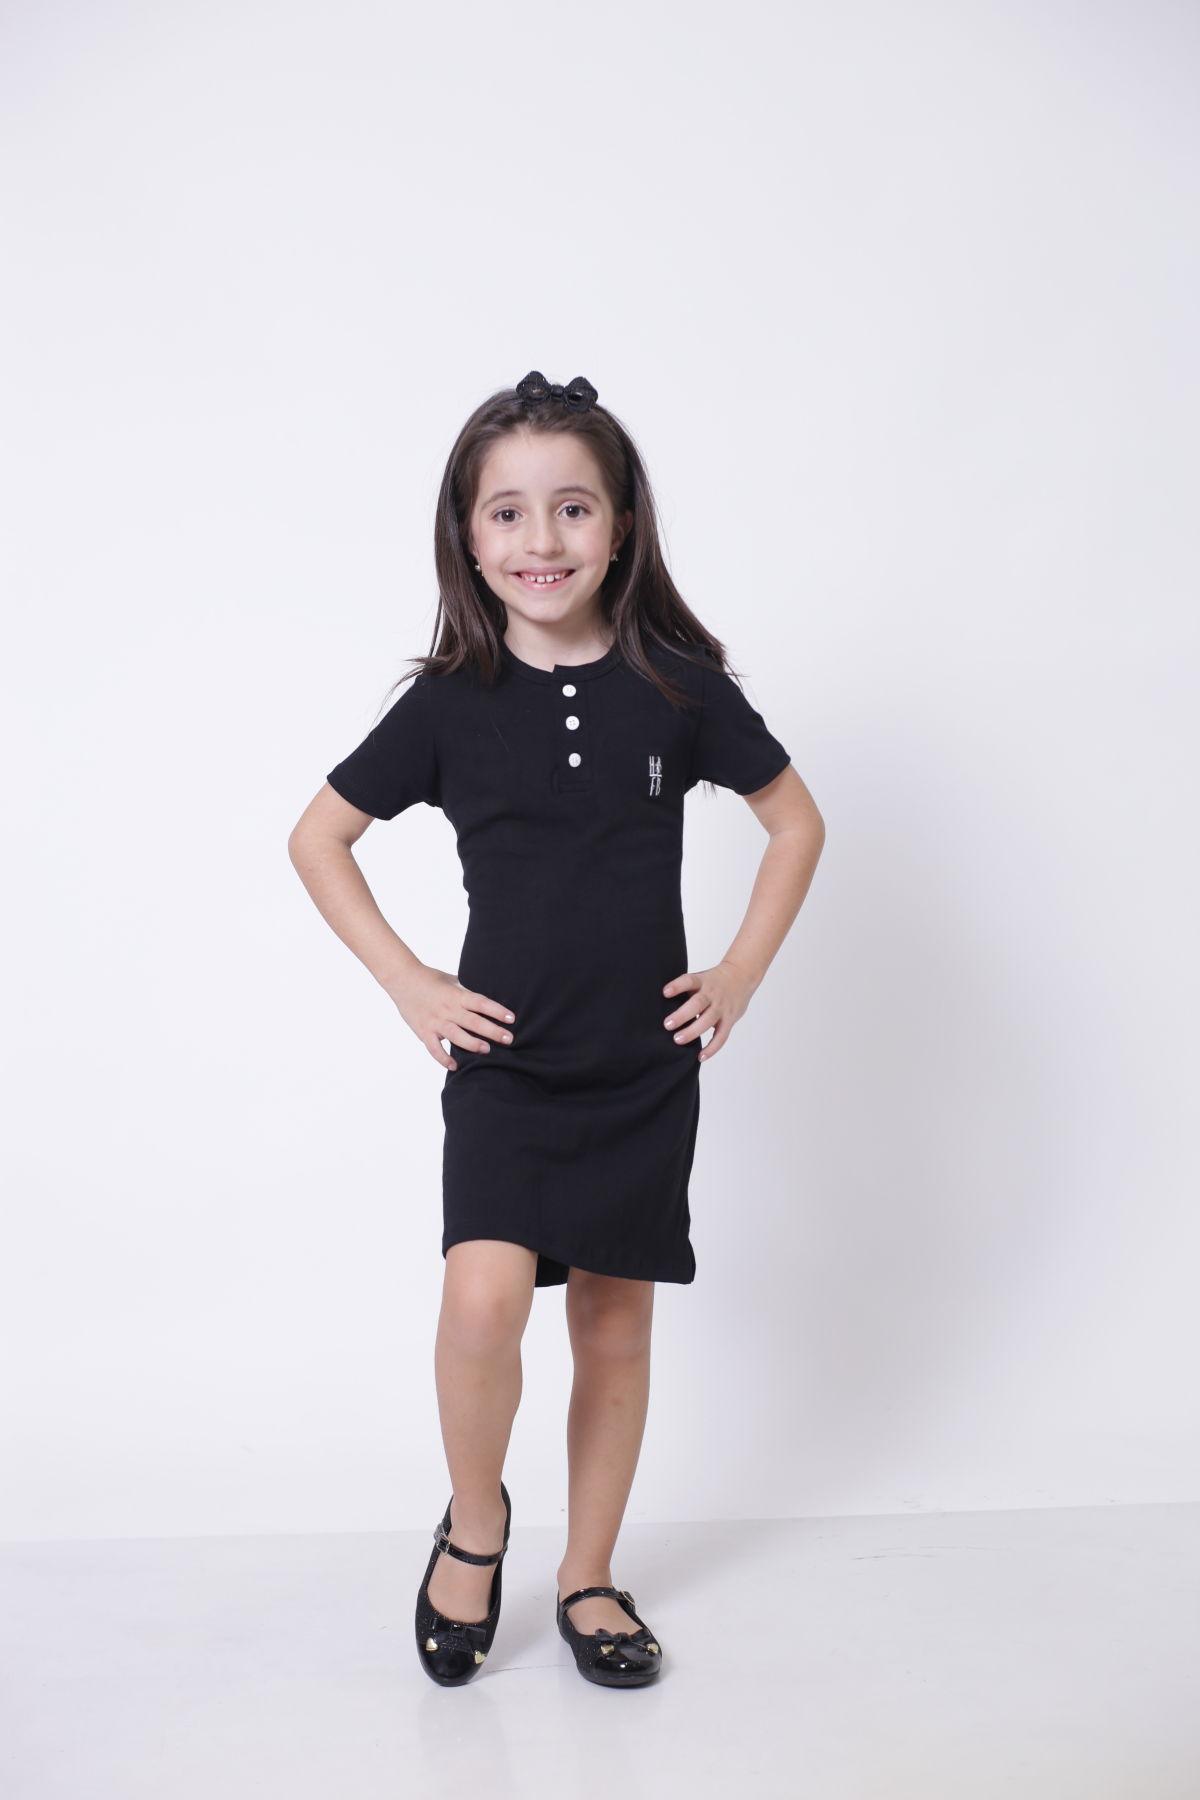 PAI E FILHA > T-Shirt Adulto  + Vestido Infantil - Henley - Preto  [Coleção Tal Pai Tal Filha]  - Heitor Fashion Brazil